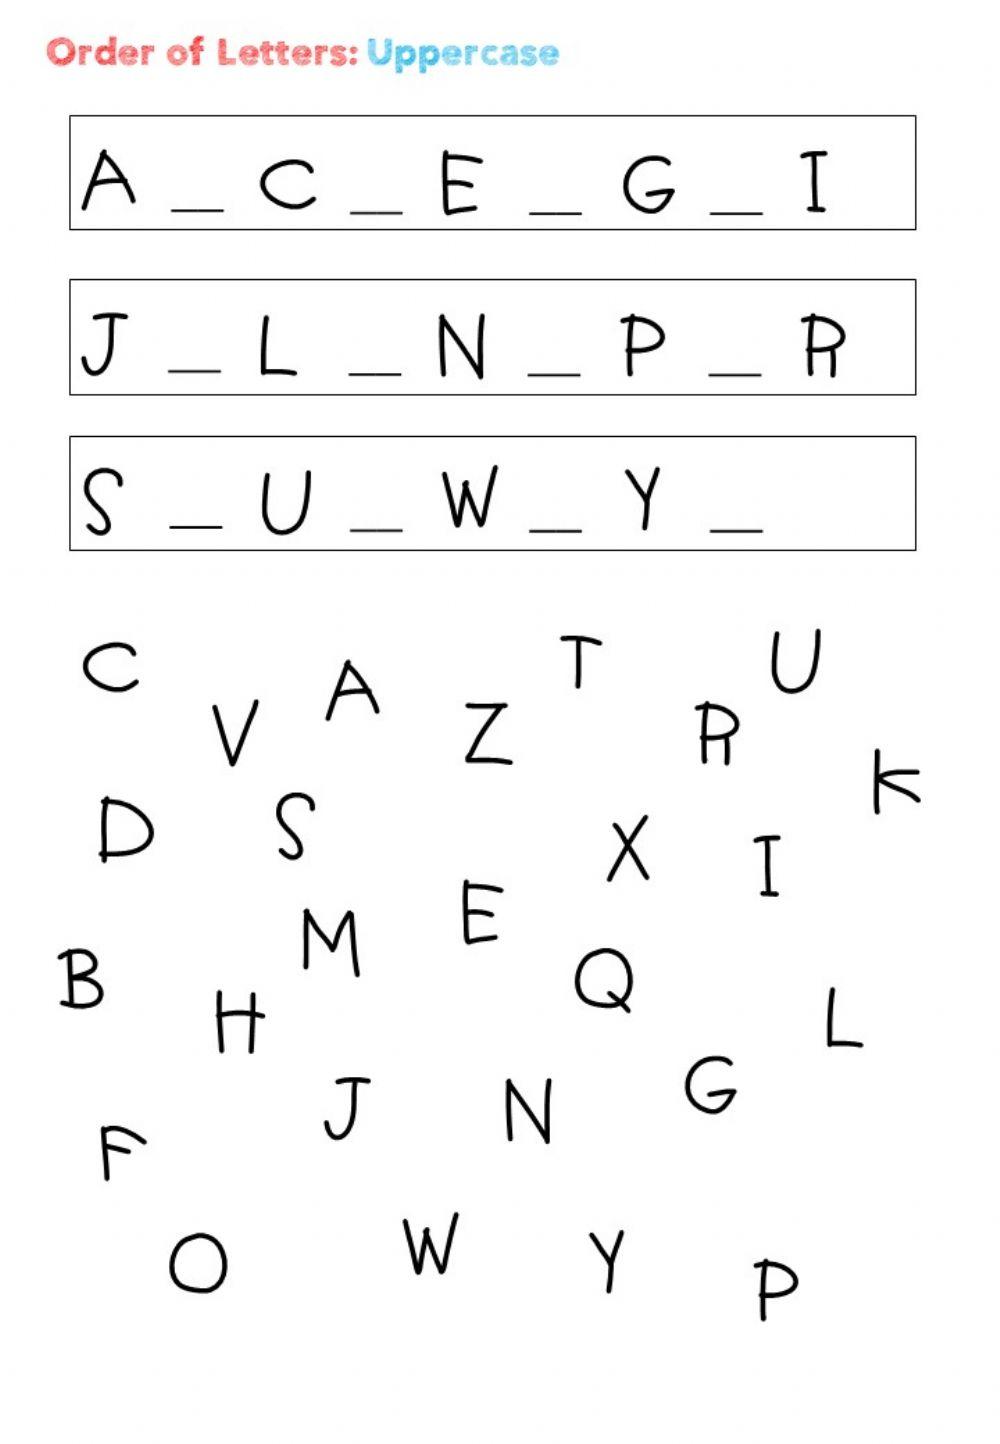 Order Of The Letter: Uppercase - Interactive Worksheet intended for Letter Order Worksheets